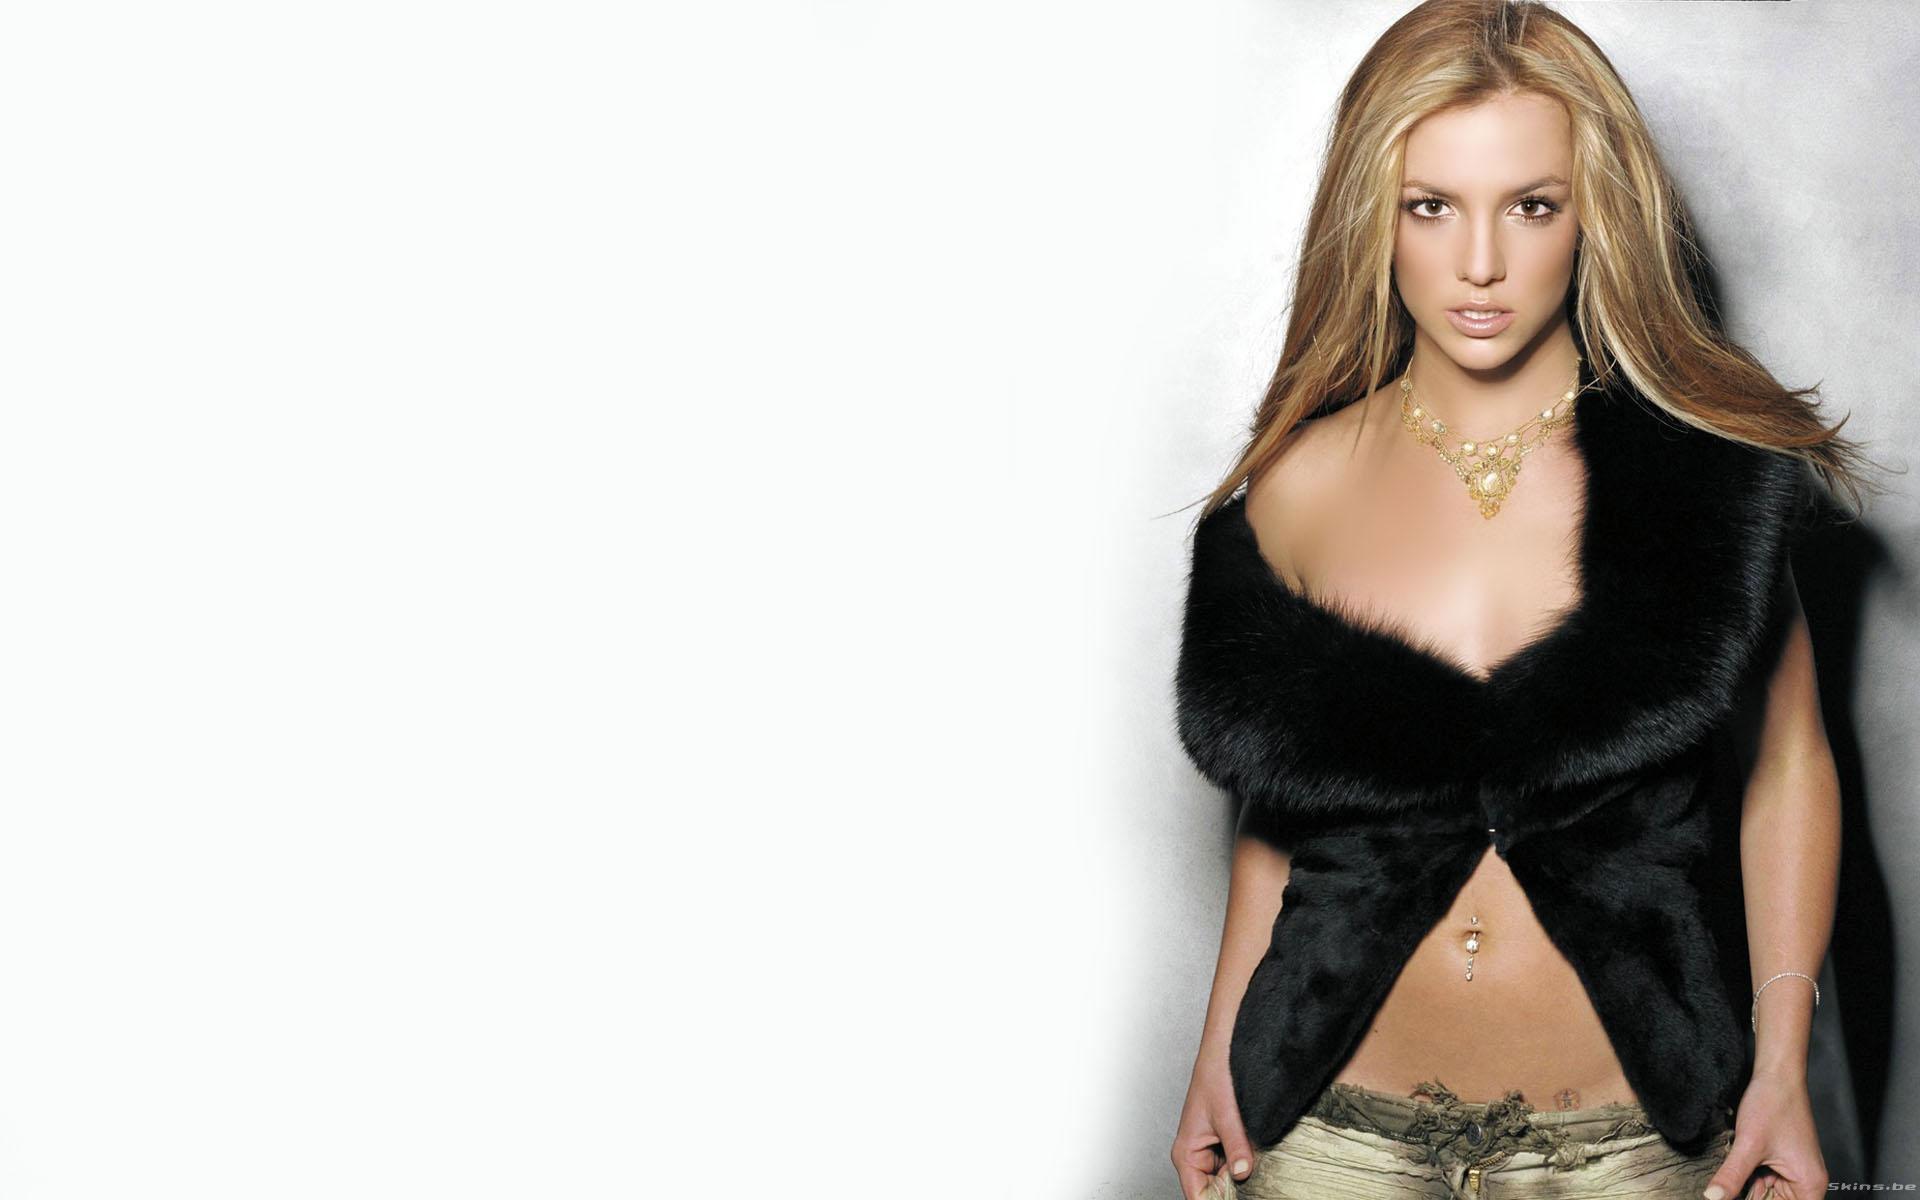 Britney Spears sensual - 1920x1200